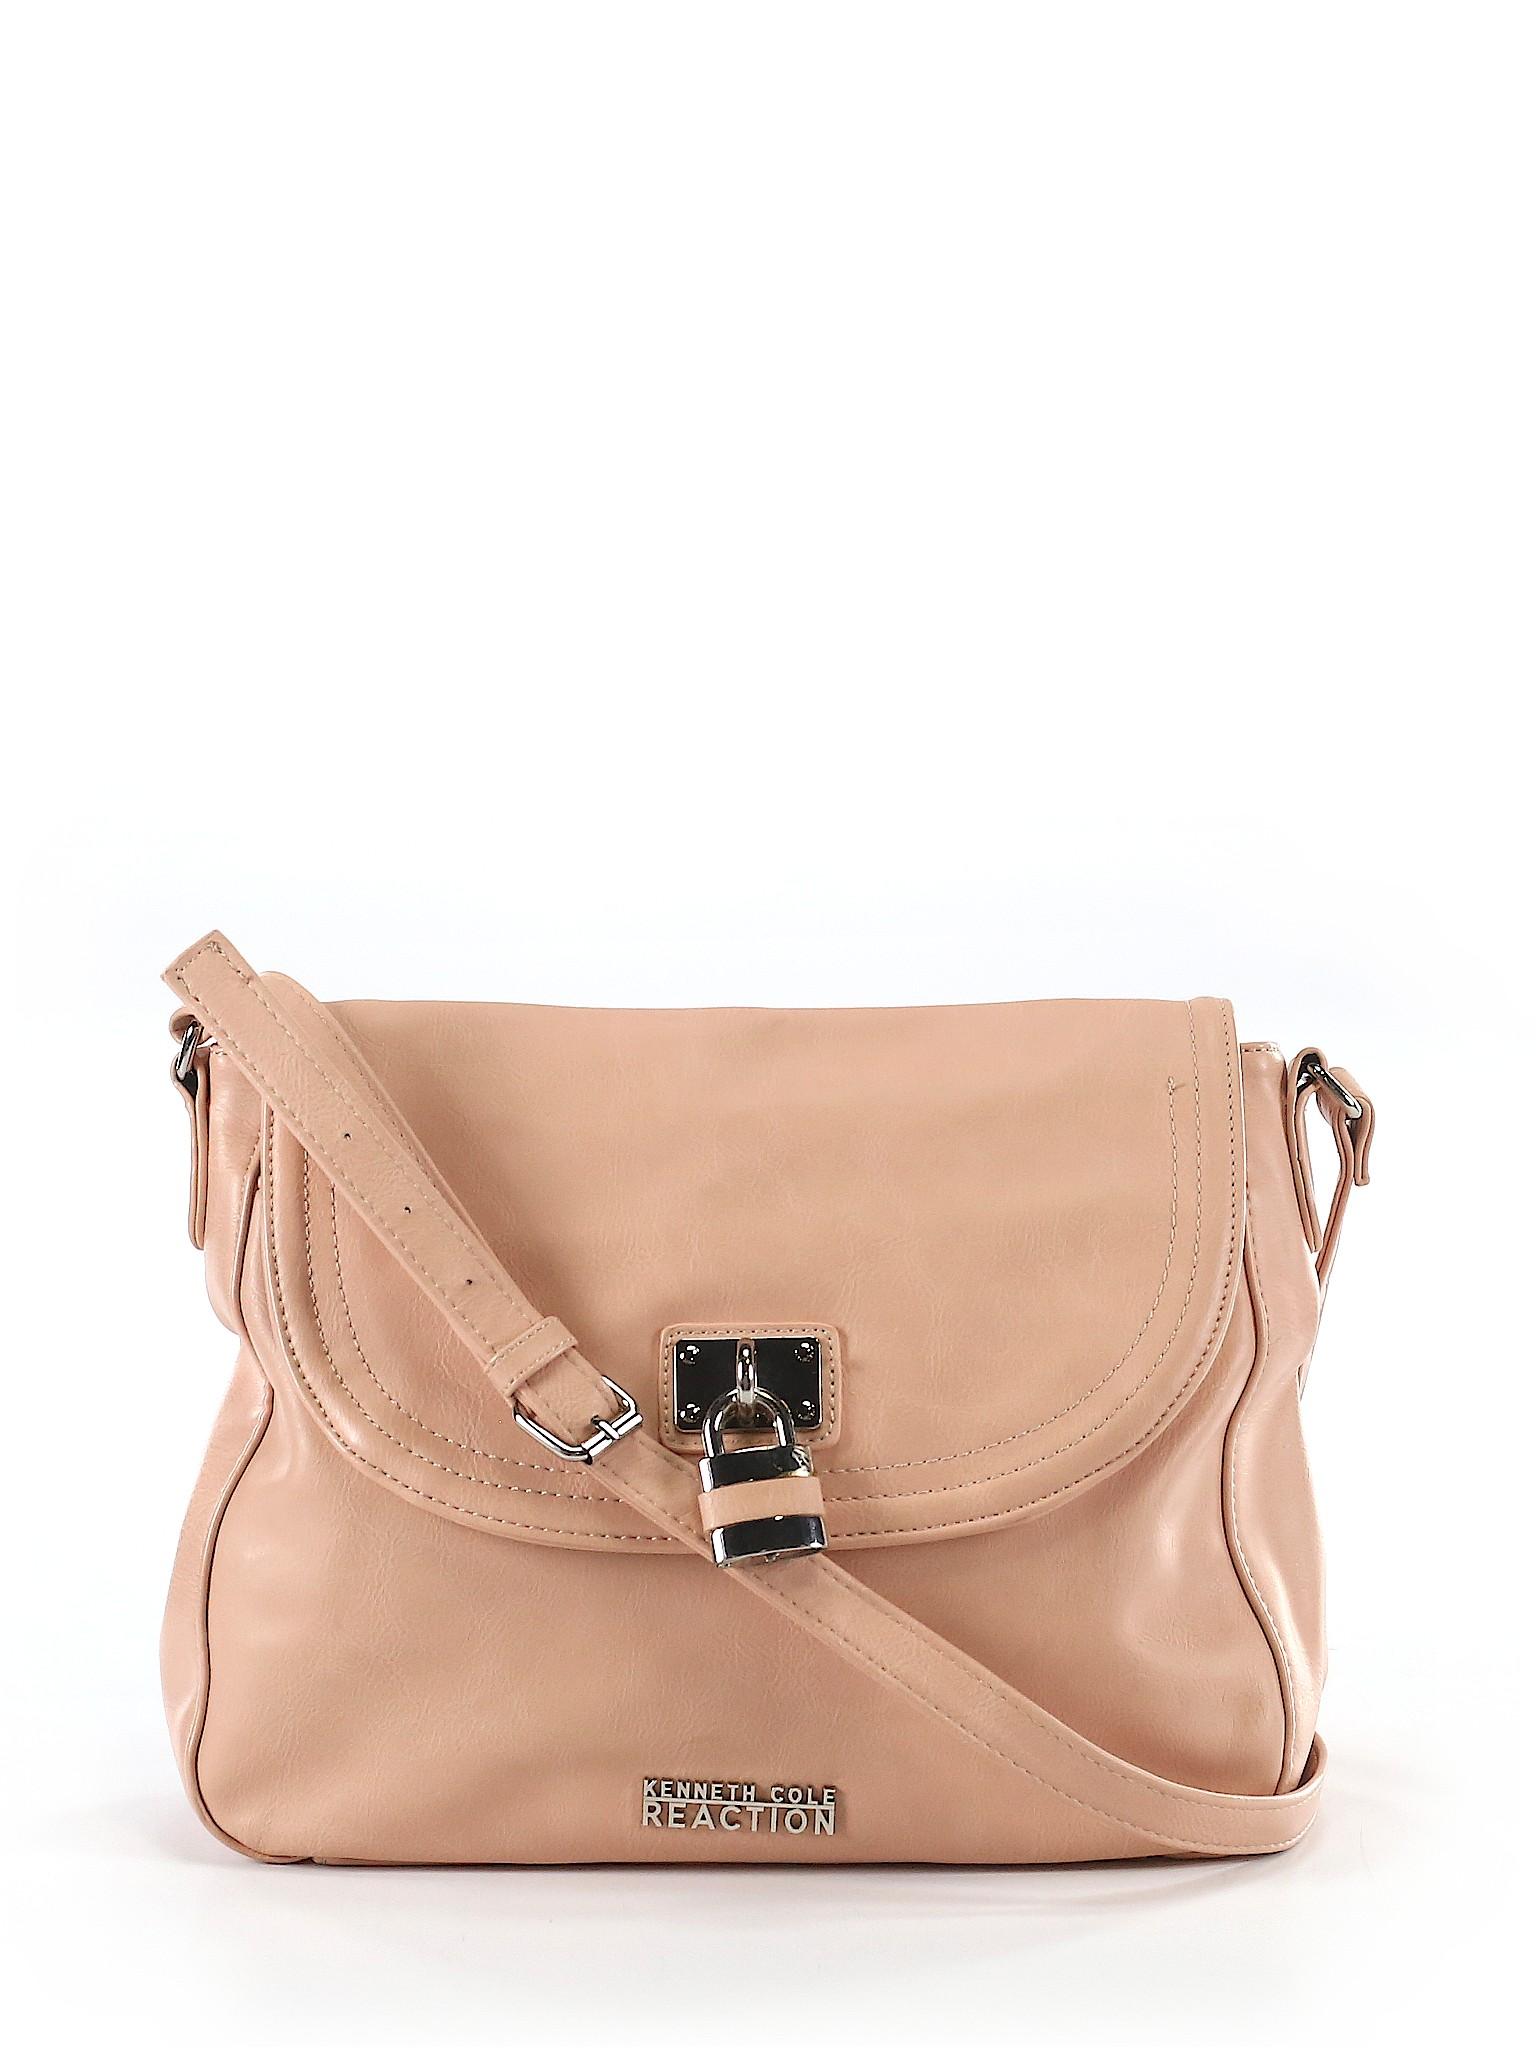 Kenneth cole reaction crossbody bags on sale up to off retail thredup jpg  1536x2048 Kenneth cole da84fe1819b82